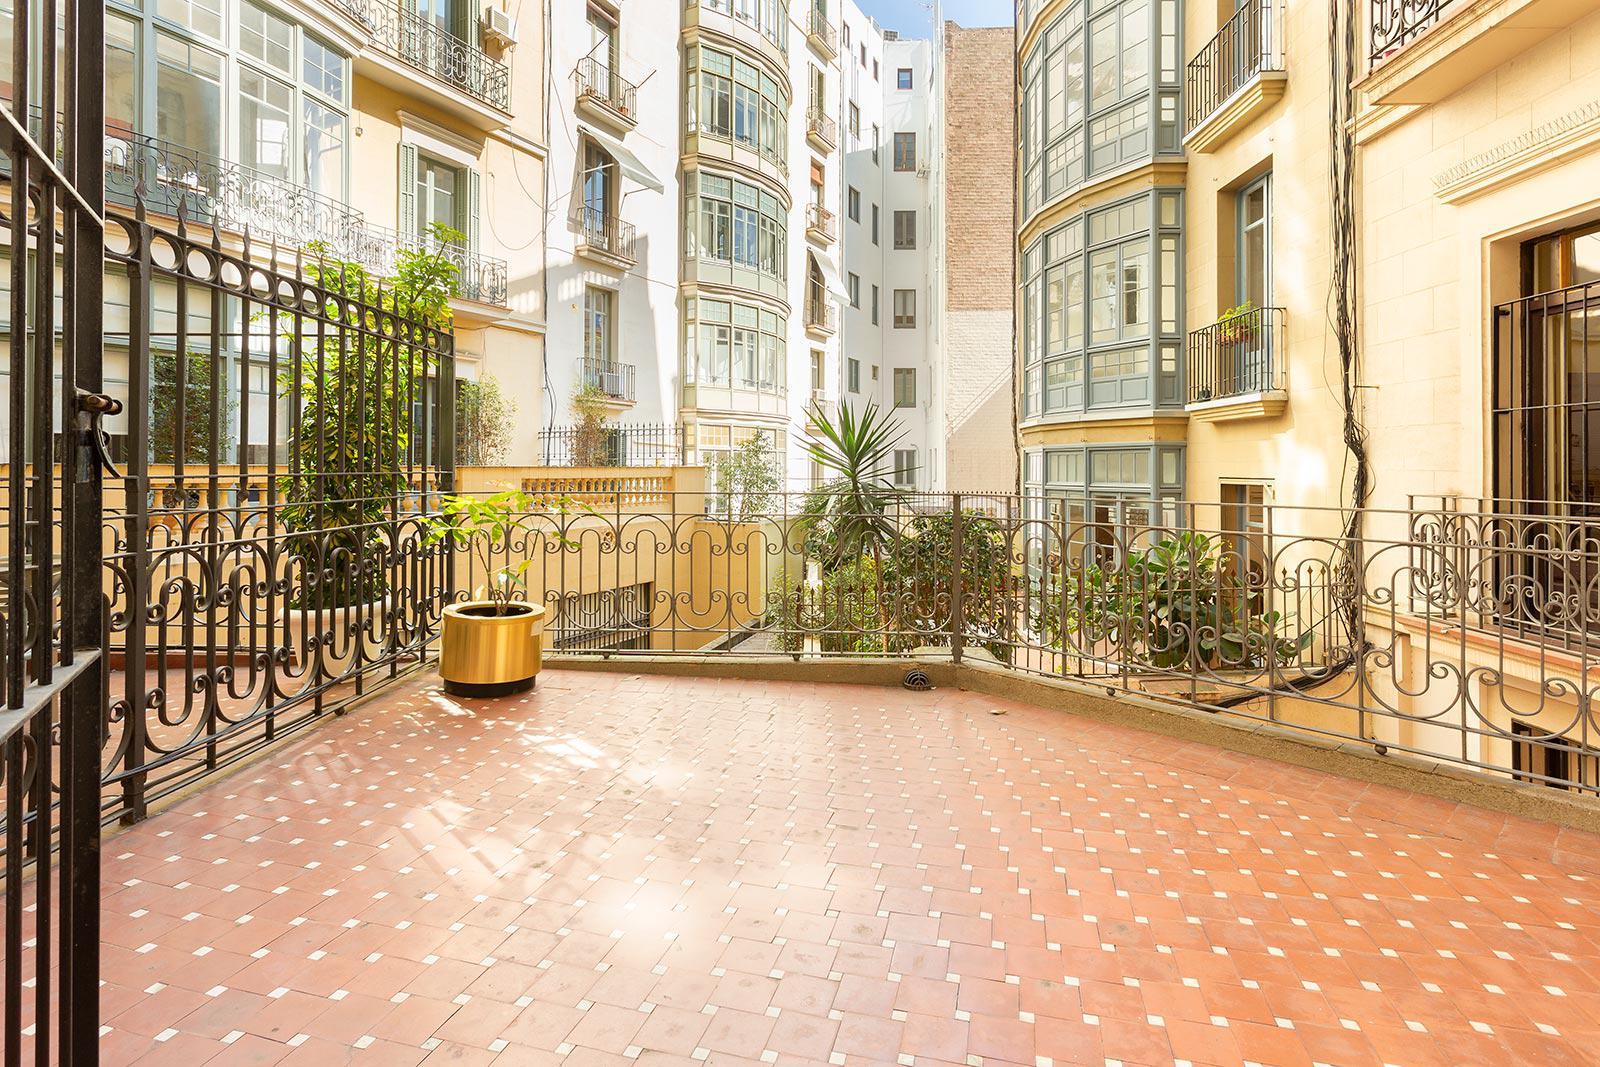 214993 Apartamento en venda en Eixample, Dreta Eixample 5